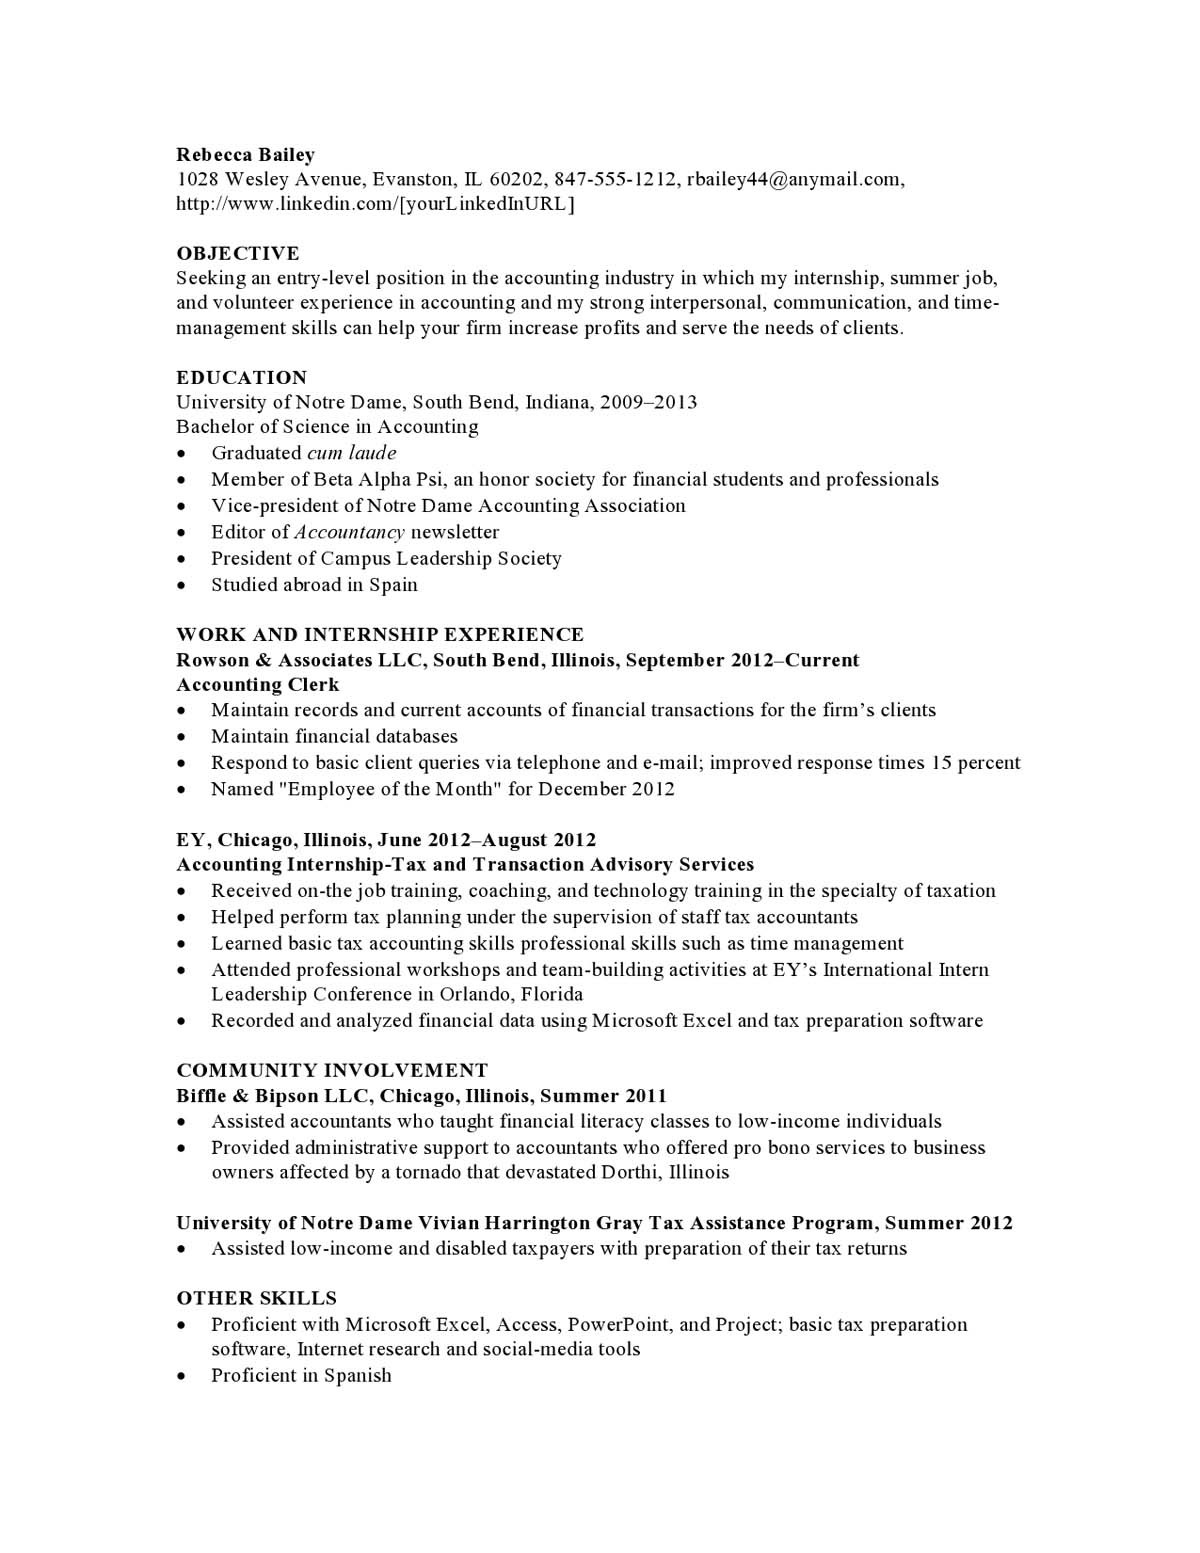 resume samples templates